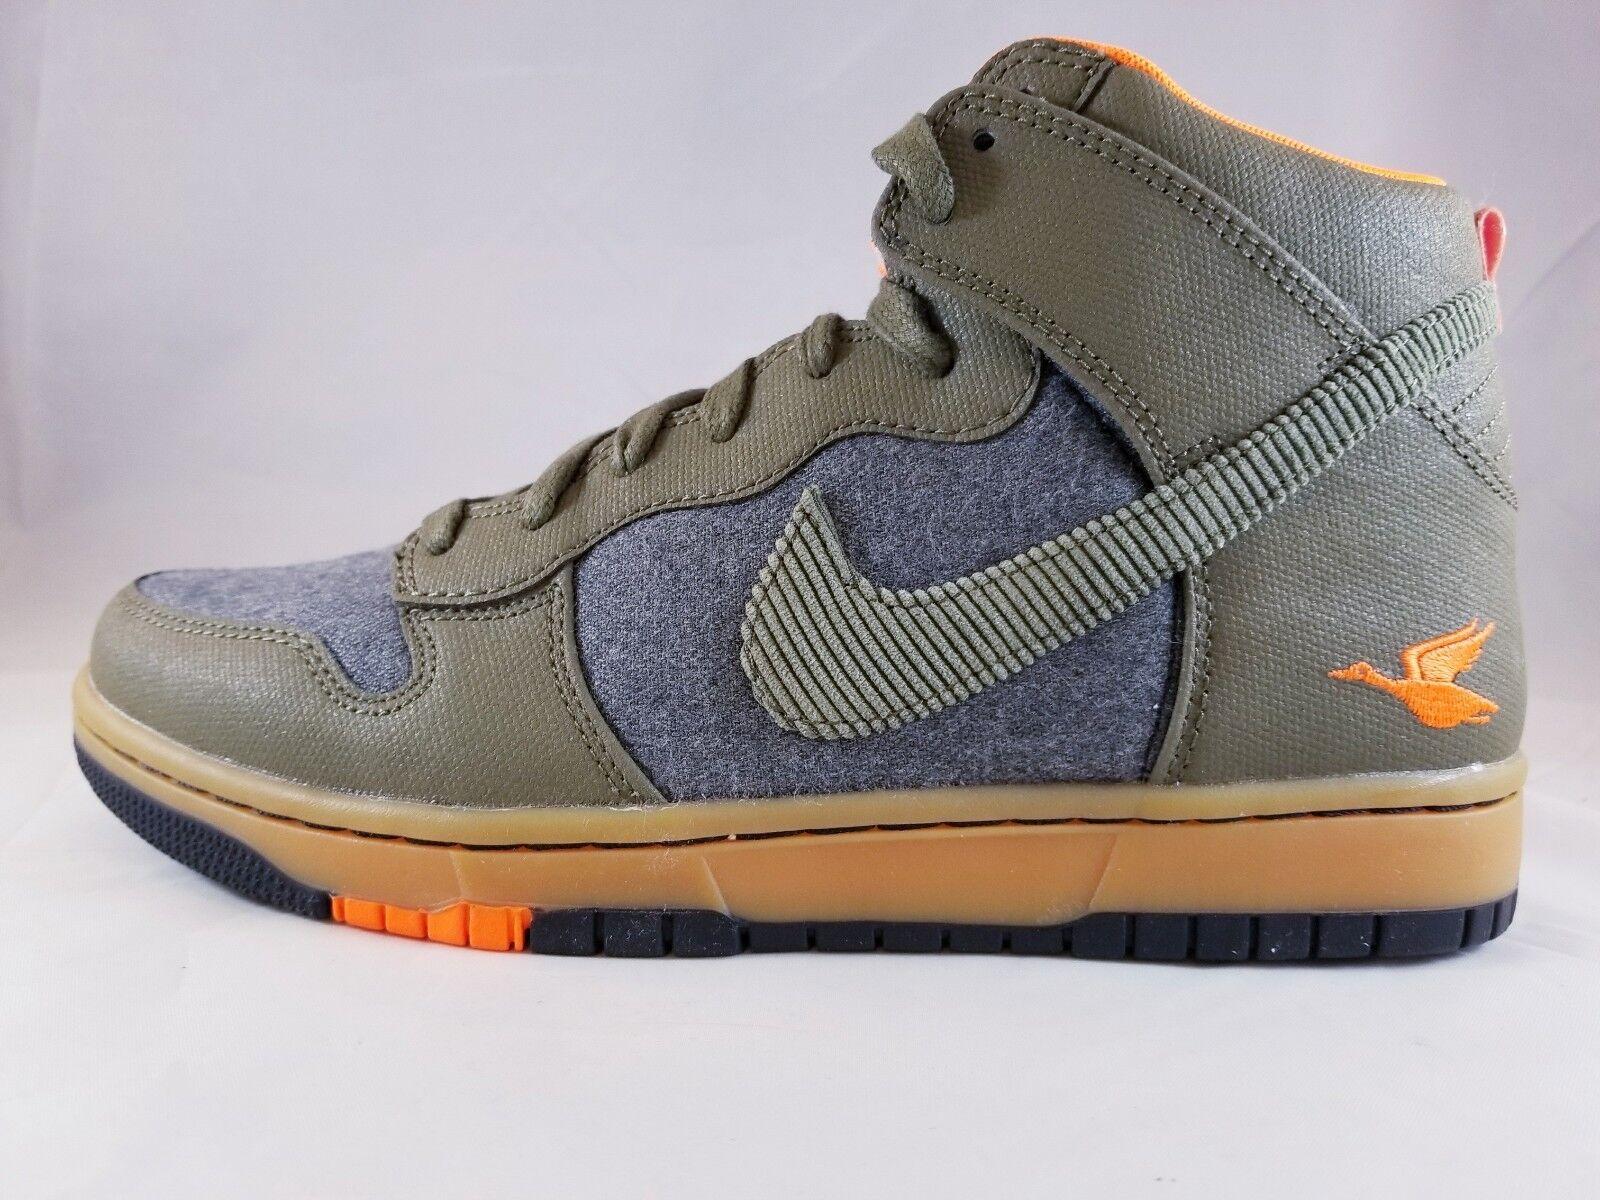 Nike Dunk CMFT PRM Men's Fashion Shoes 705433 200 Size 8